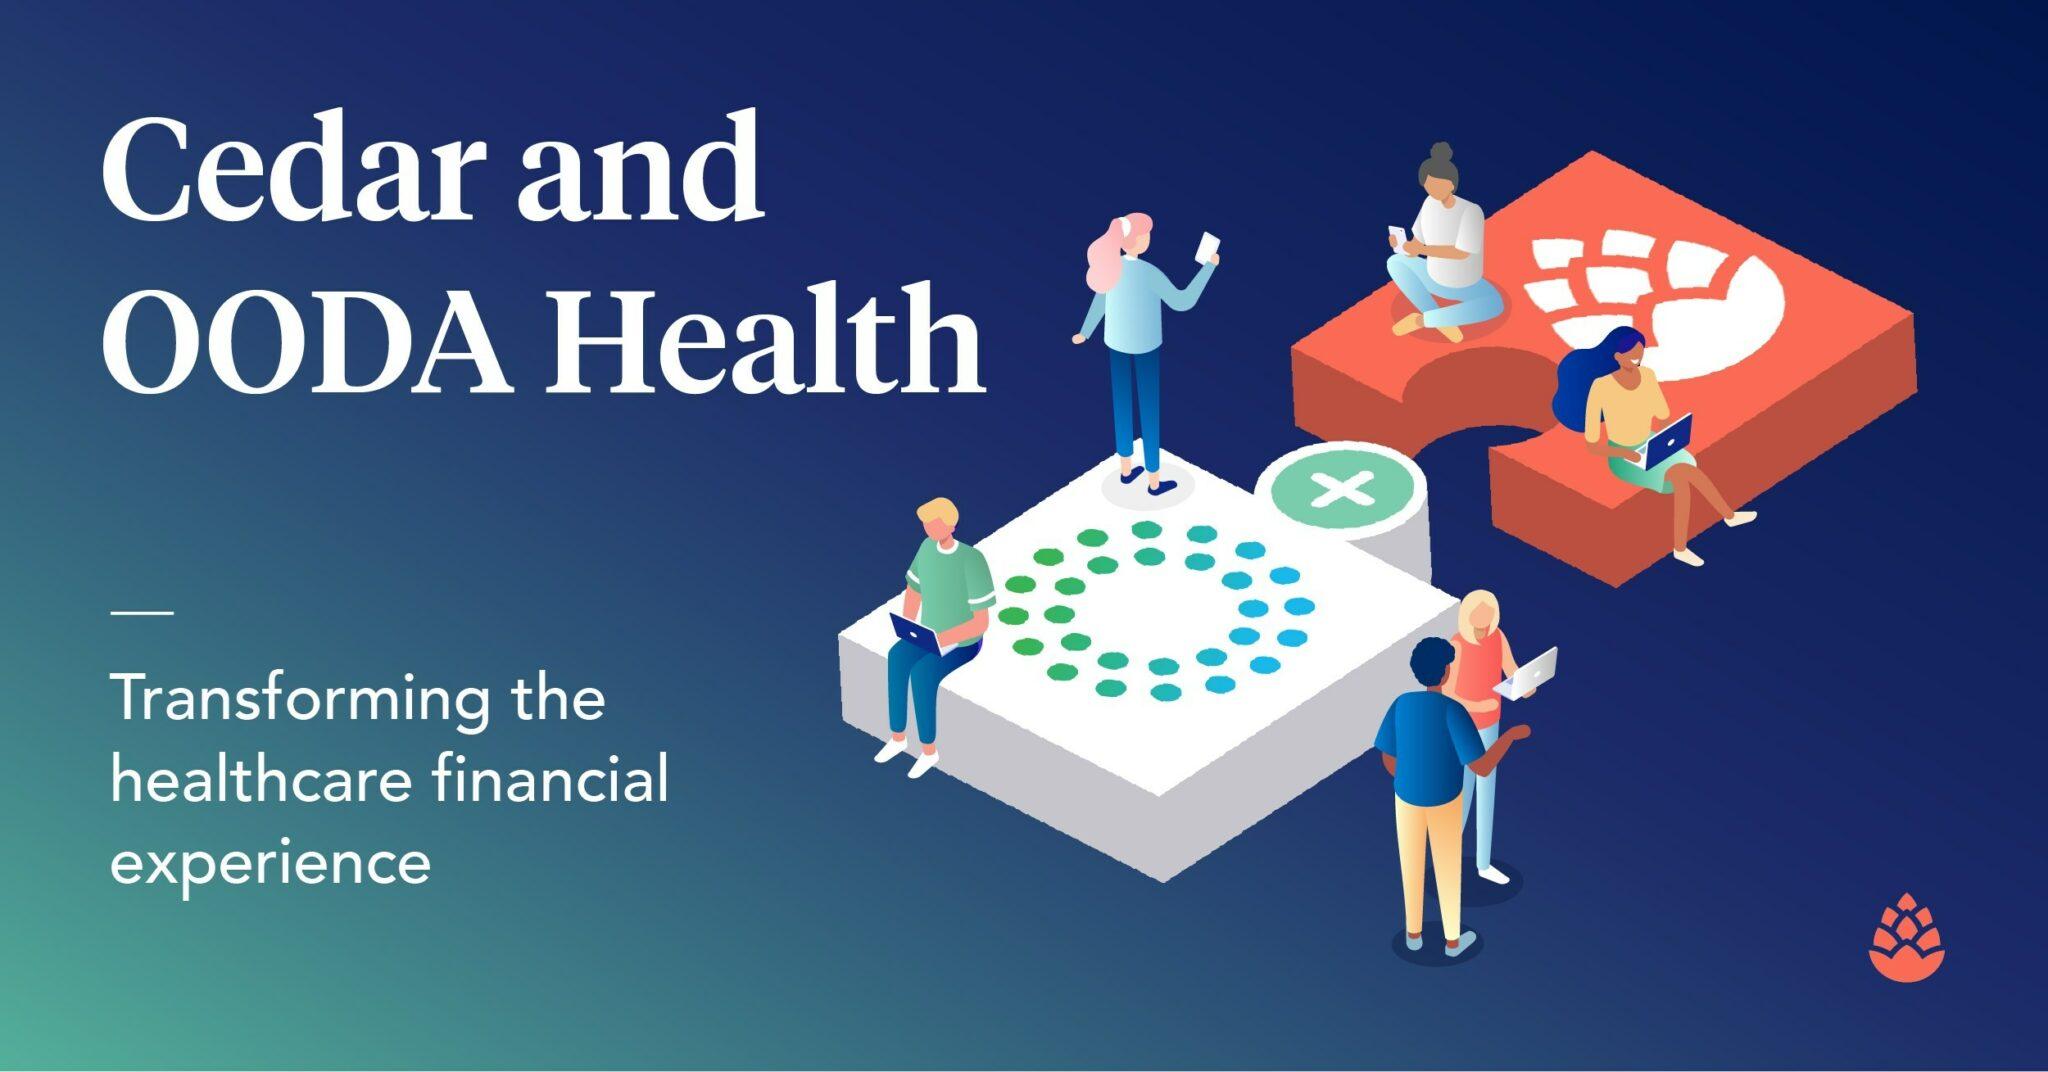 Cedar Acquires OODA Health for $425M to Power Healthcare Financial Tech Platform